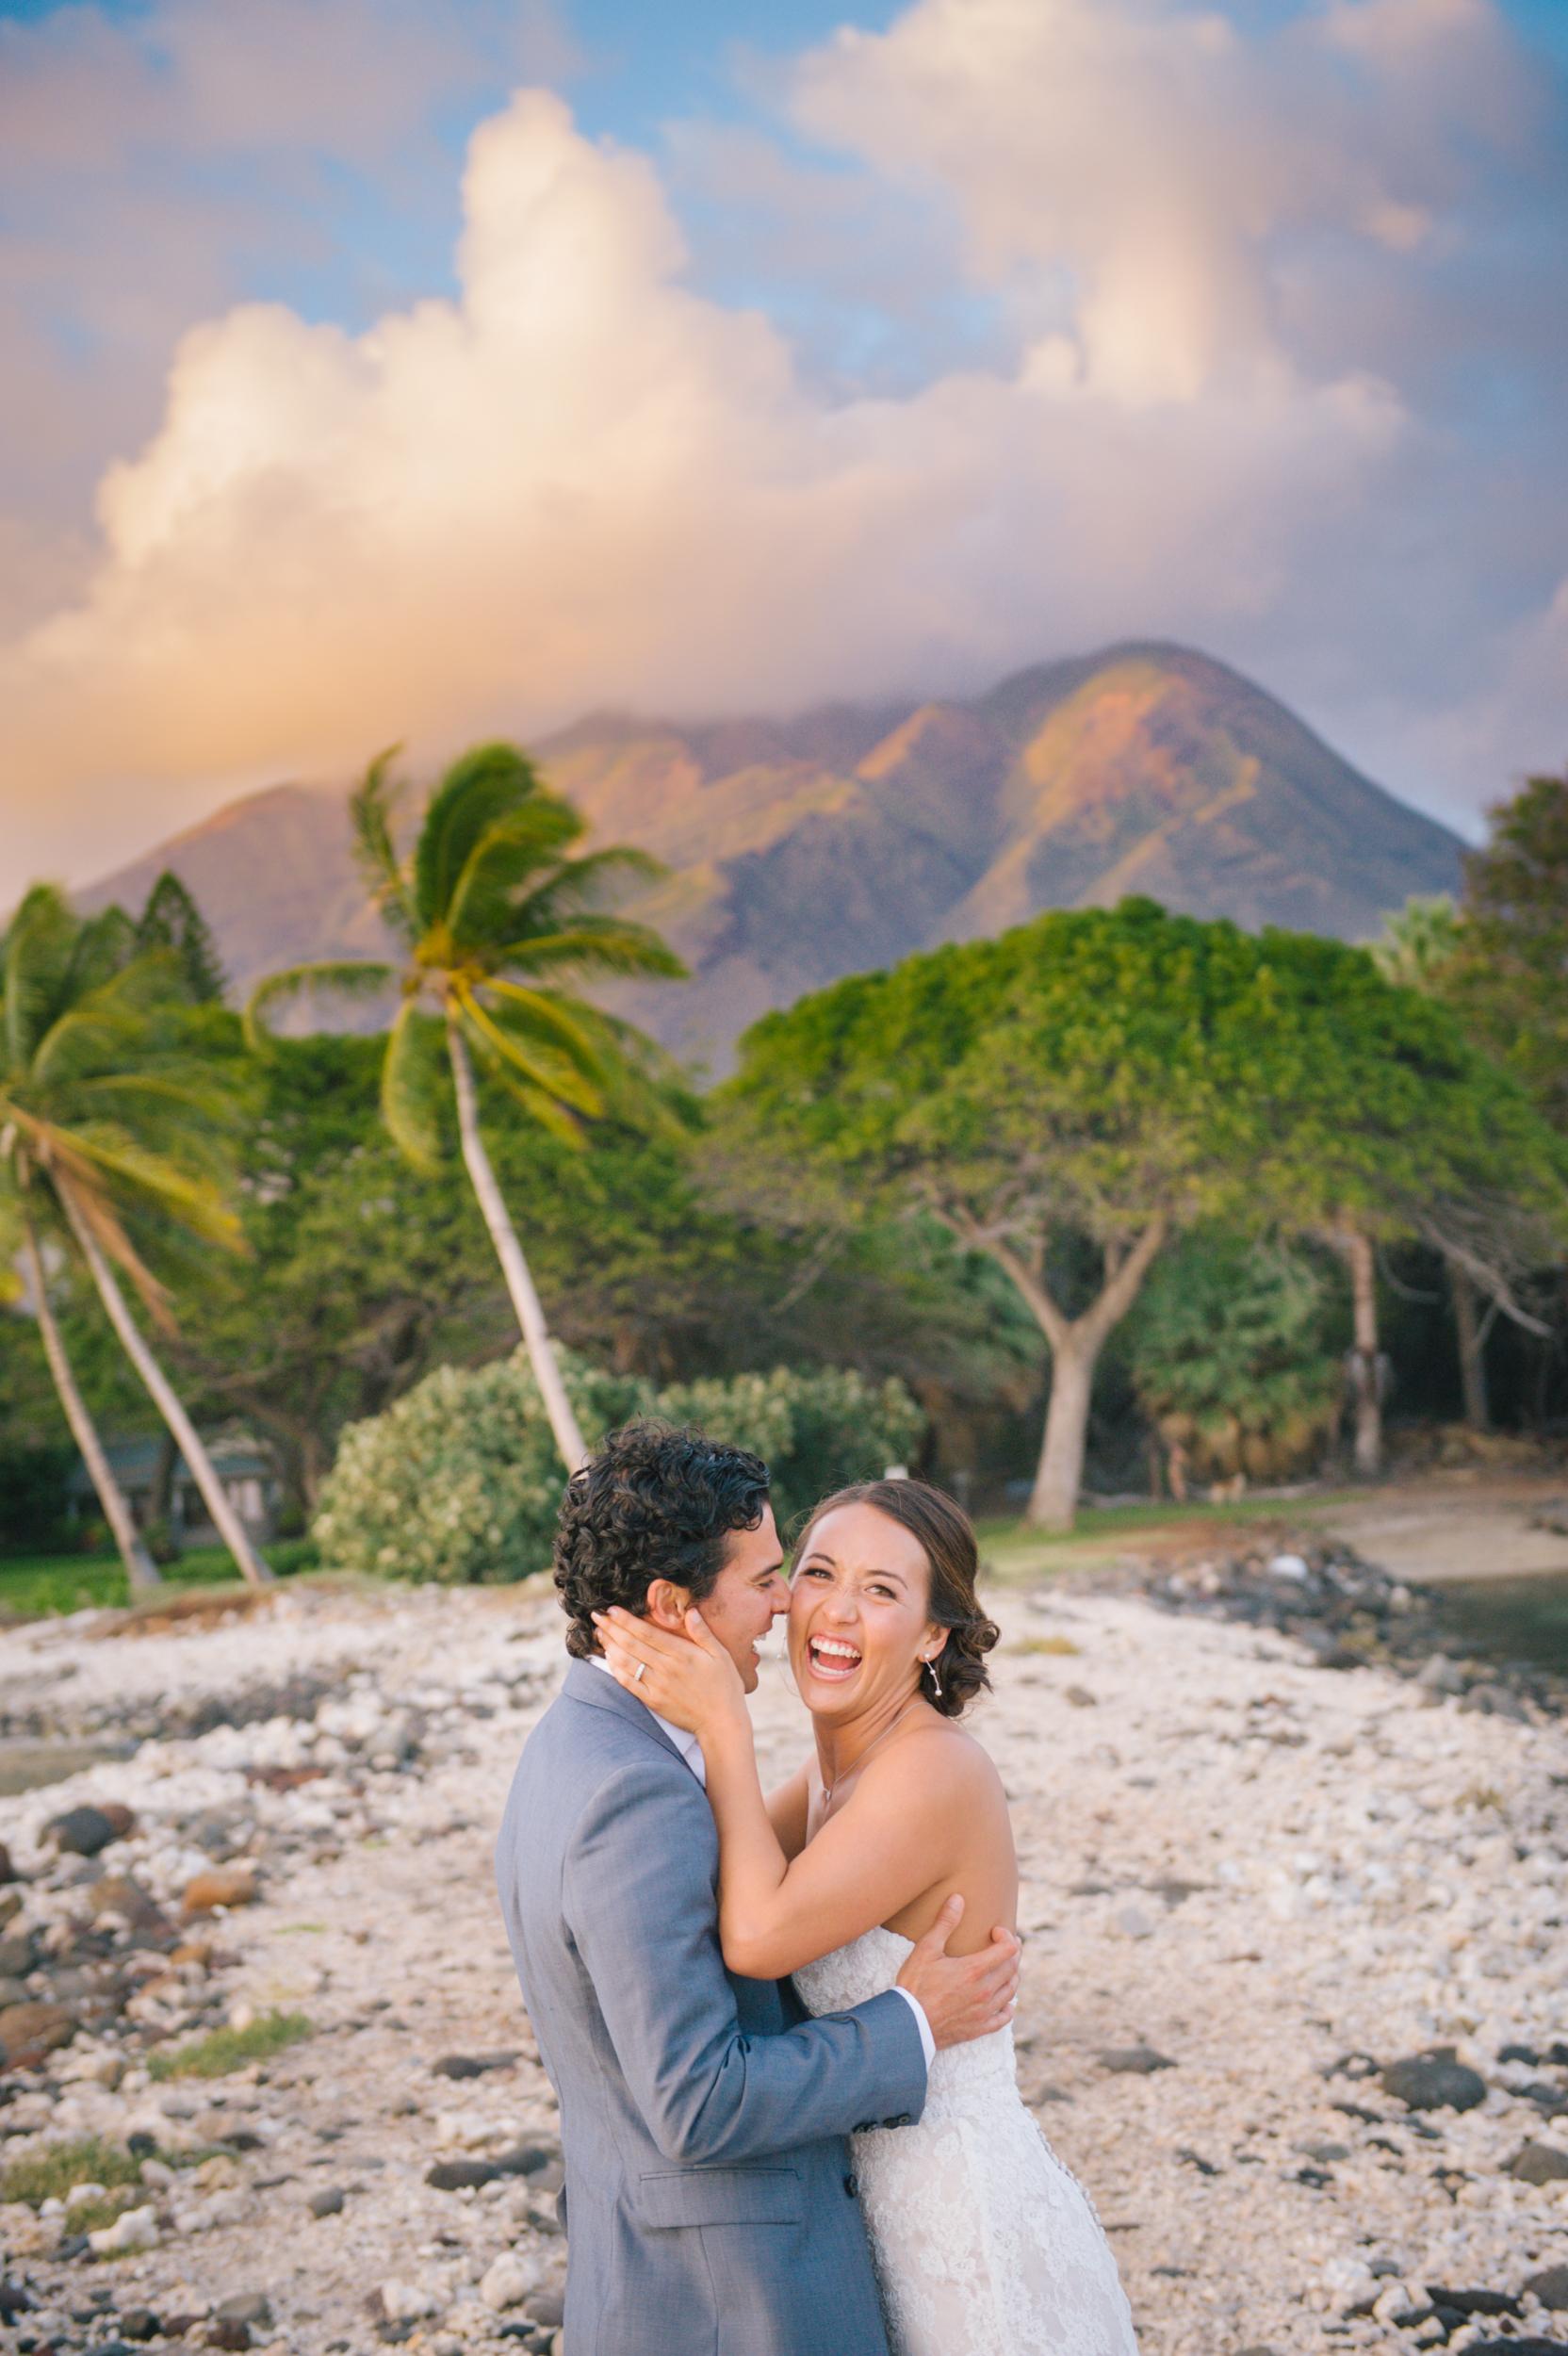 JKP-Destination-Weddings-0058.JPG